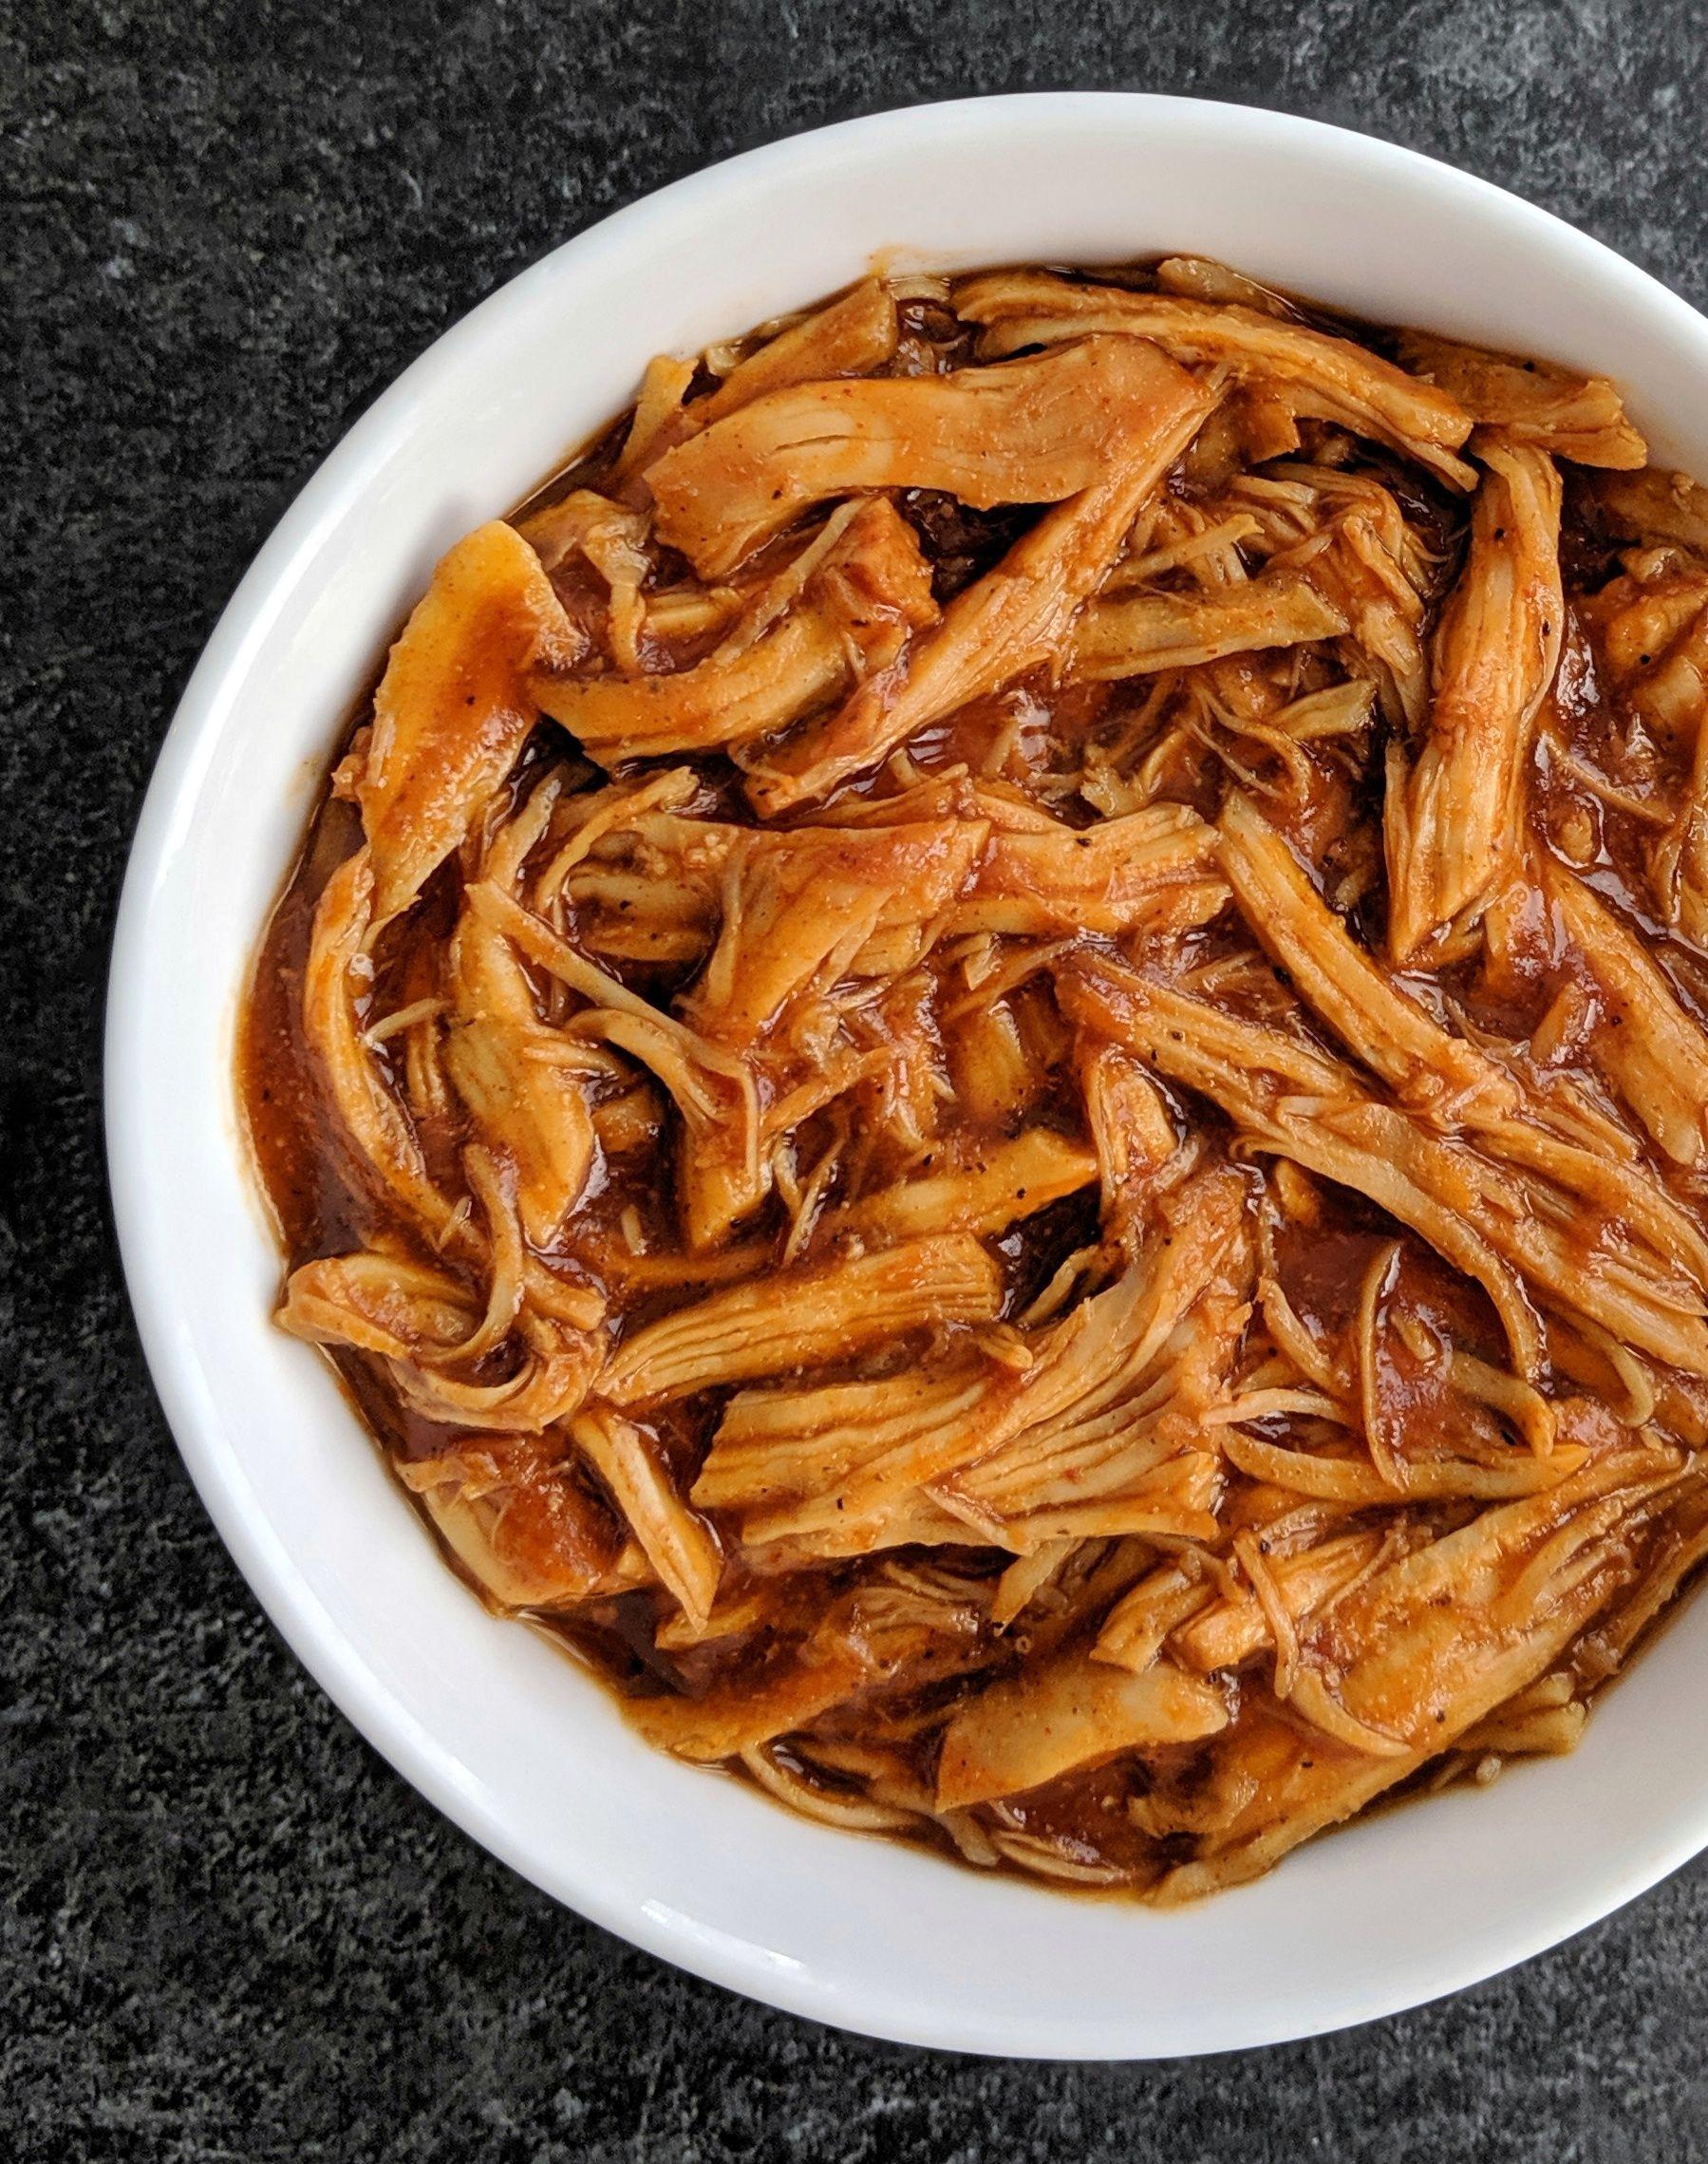 Bbq Chicken Crockpot Keto  Keto Shredded BBQ Chicken Recipe in 2020